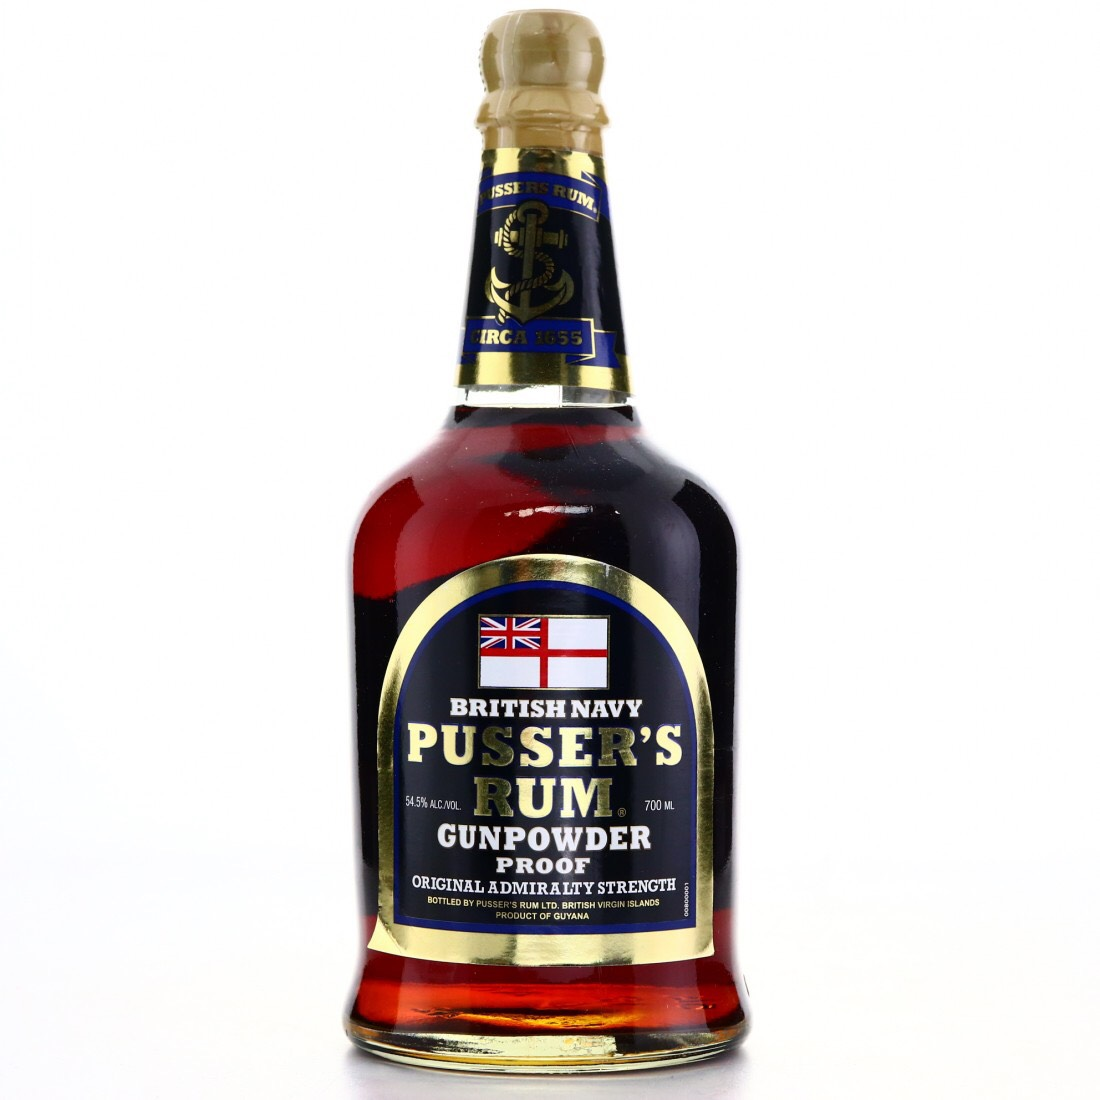 Bottle image of Gunpowder Proof (Black Label)